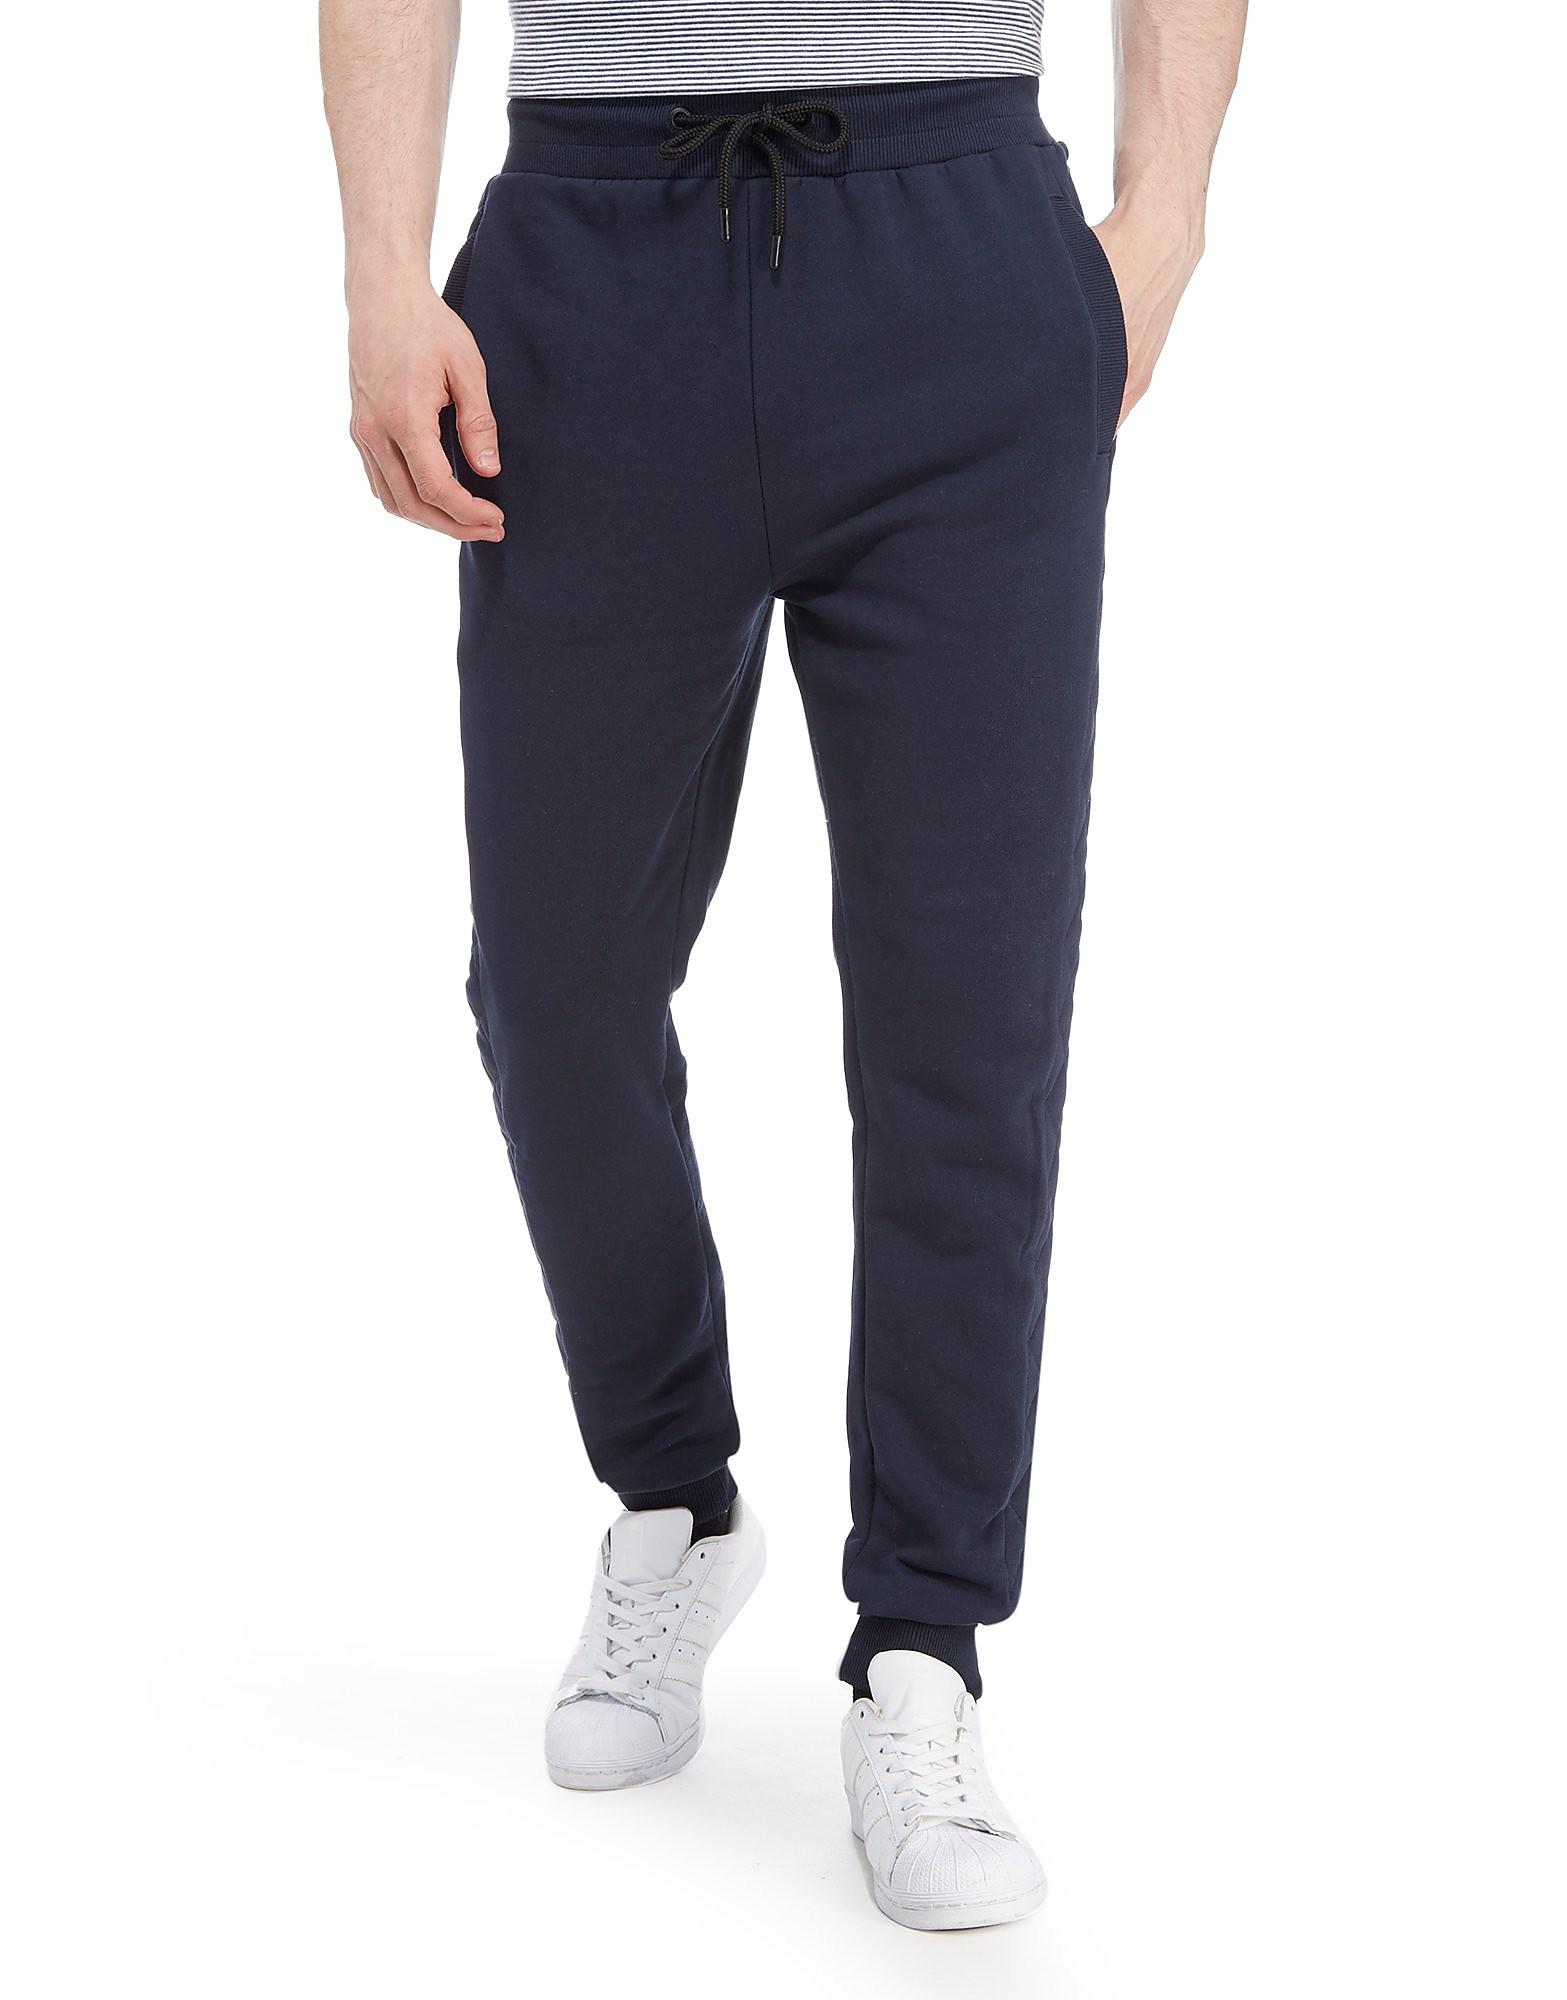 Nanny State Crossley Jogging Pants